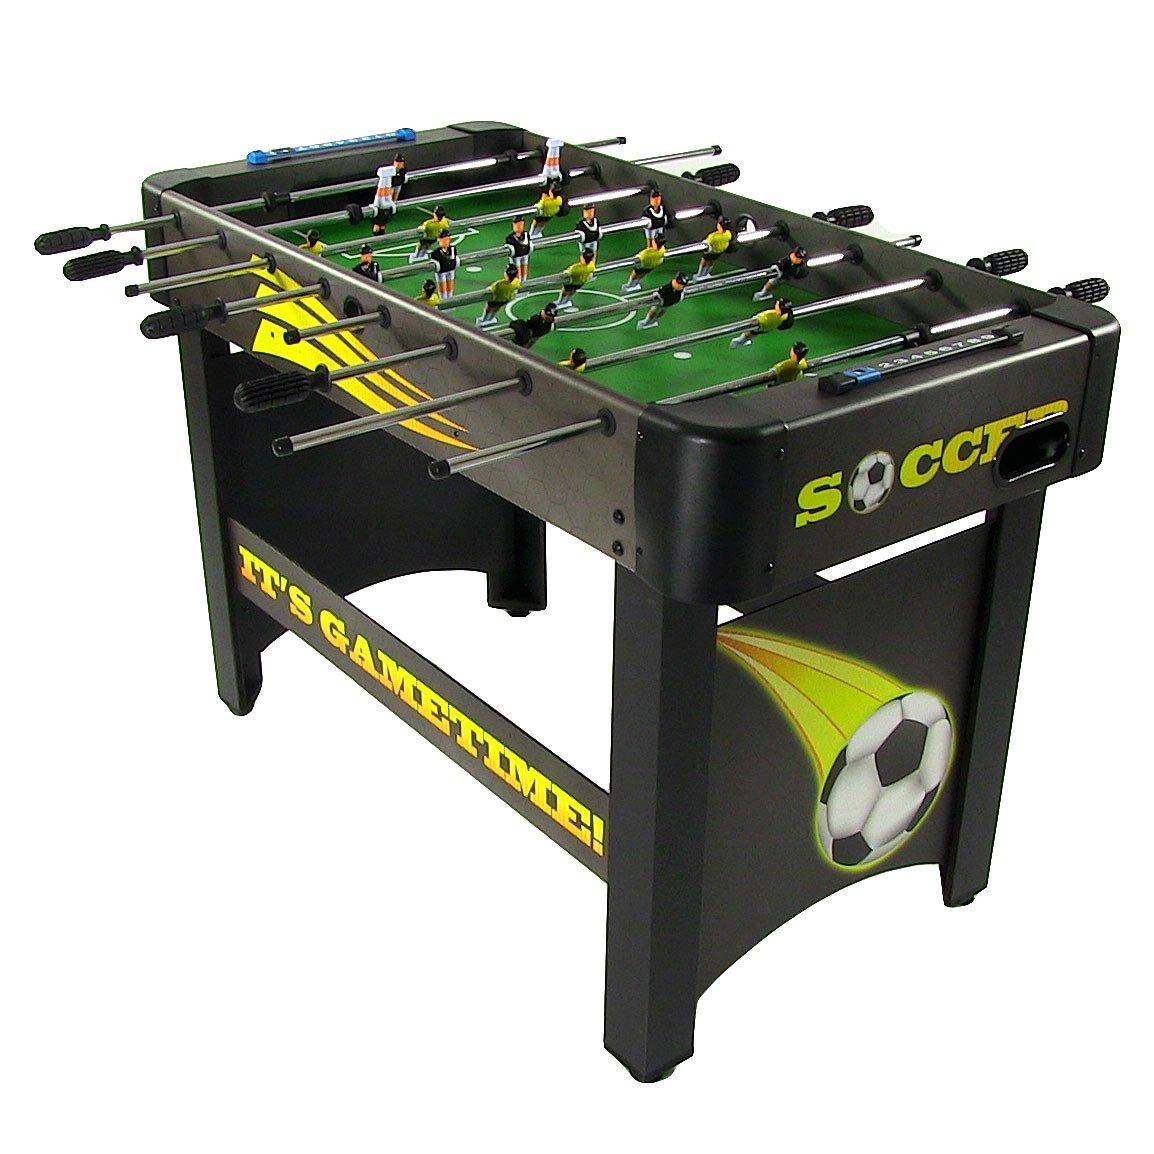 Sunnydaze 48 Inch Foosball Table, Sports Arcade Soccer for Pub Game Room, Indoor Use by Sunnydaze Decor